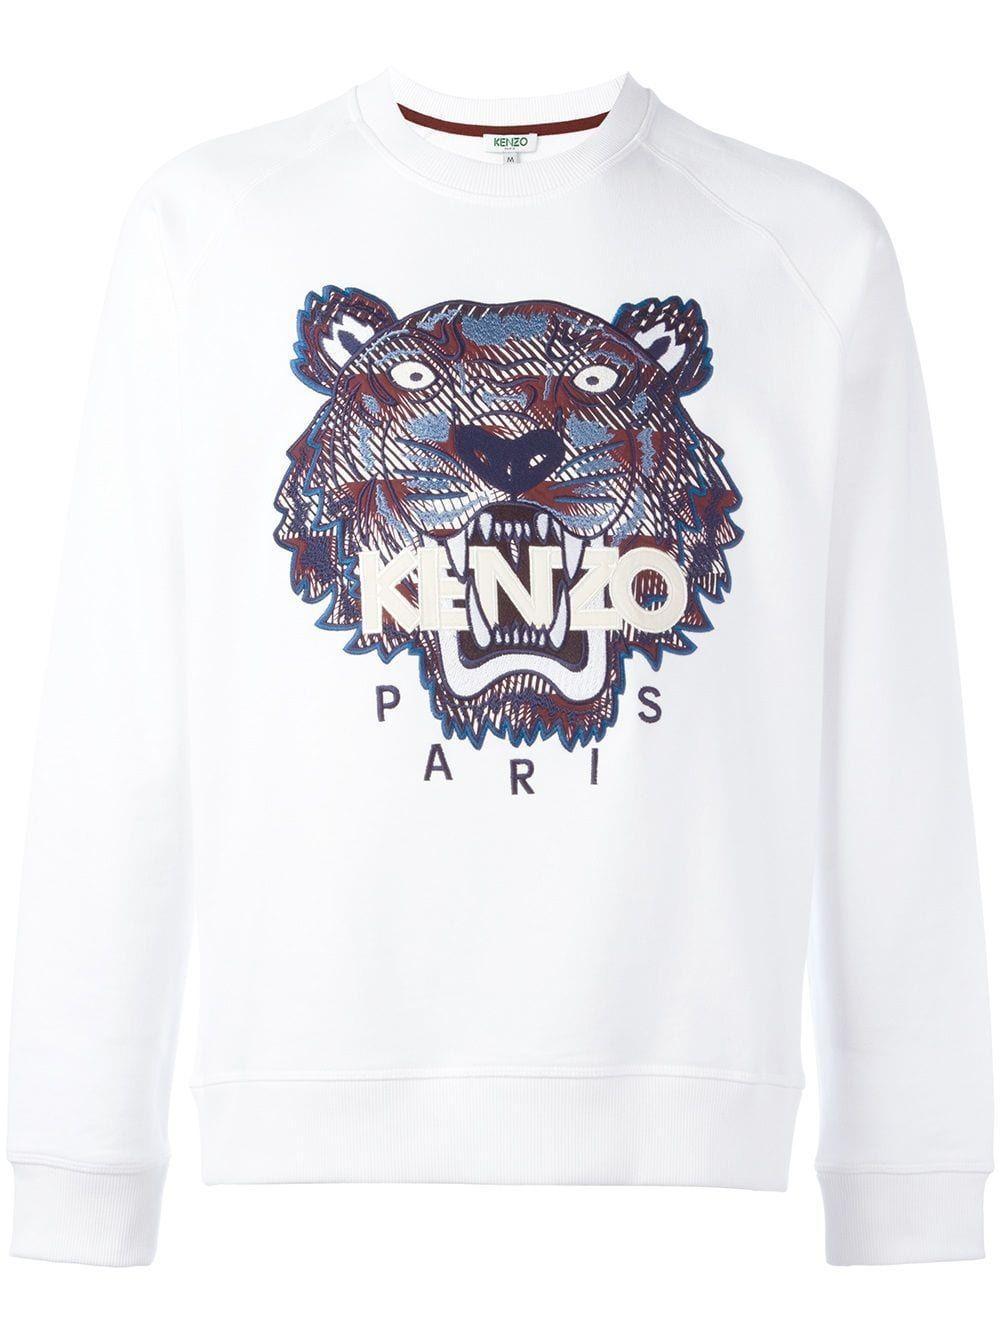 c553c49e KENZO KENZO 'TIGER' SWEATSHIRT - WHITE. #kenzo #cloth | Kenzo ...